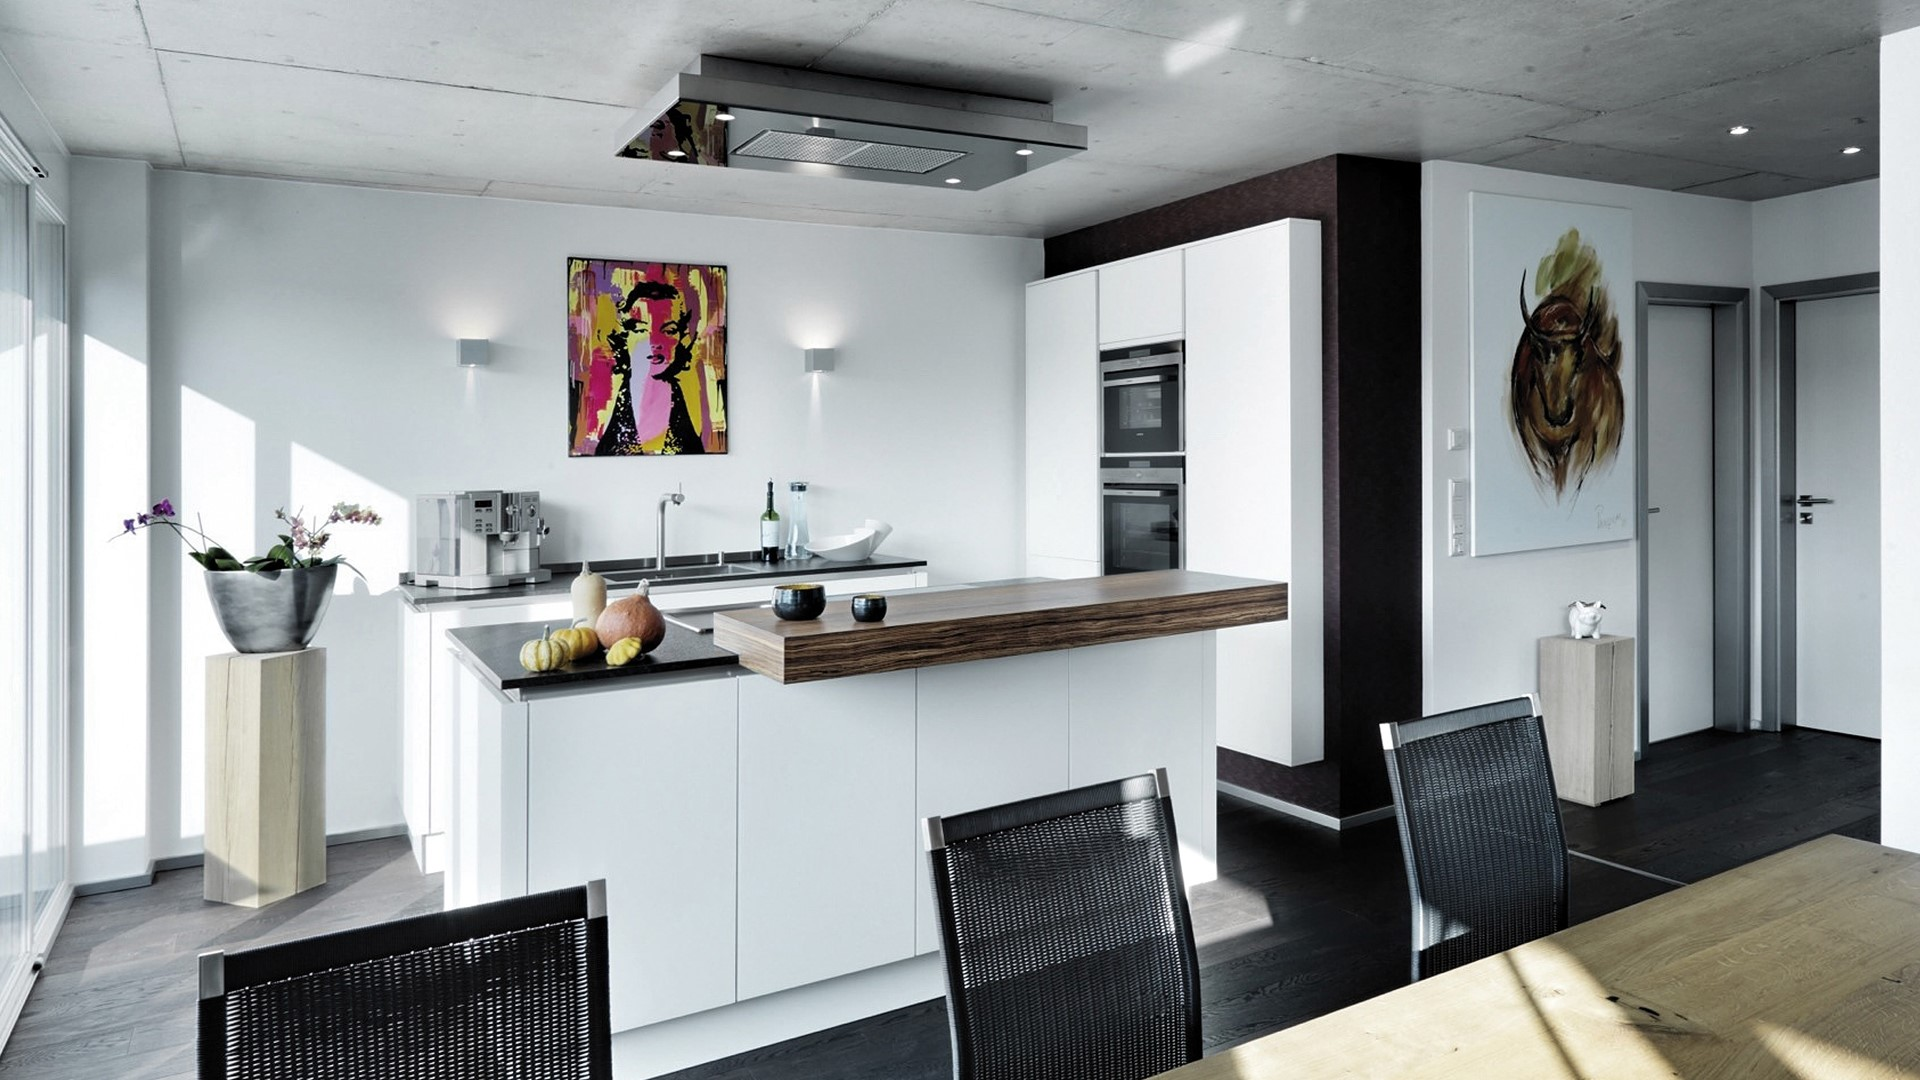 Bm5 Bocucina Küchenraumdesign